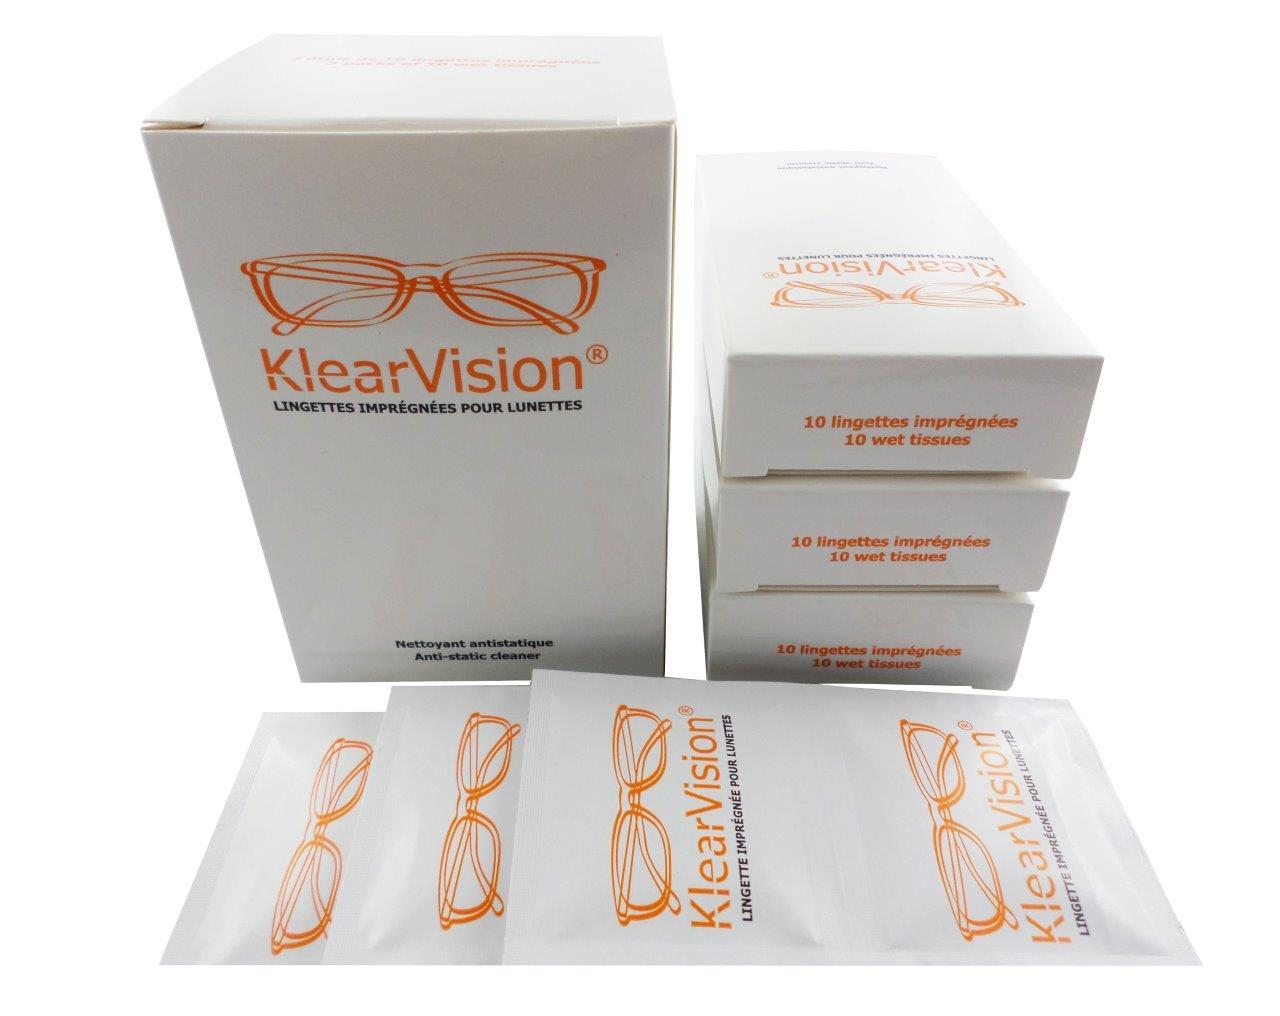 Lingettes klearvision